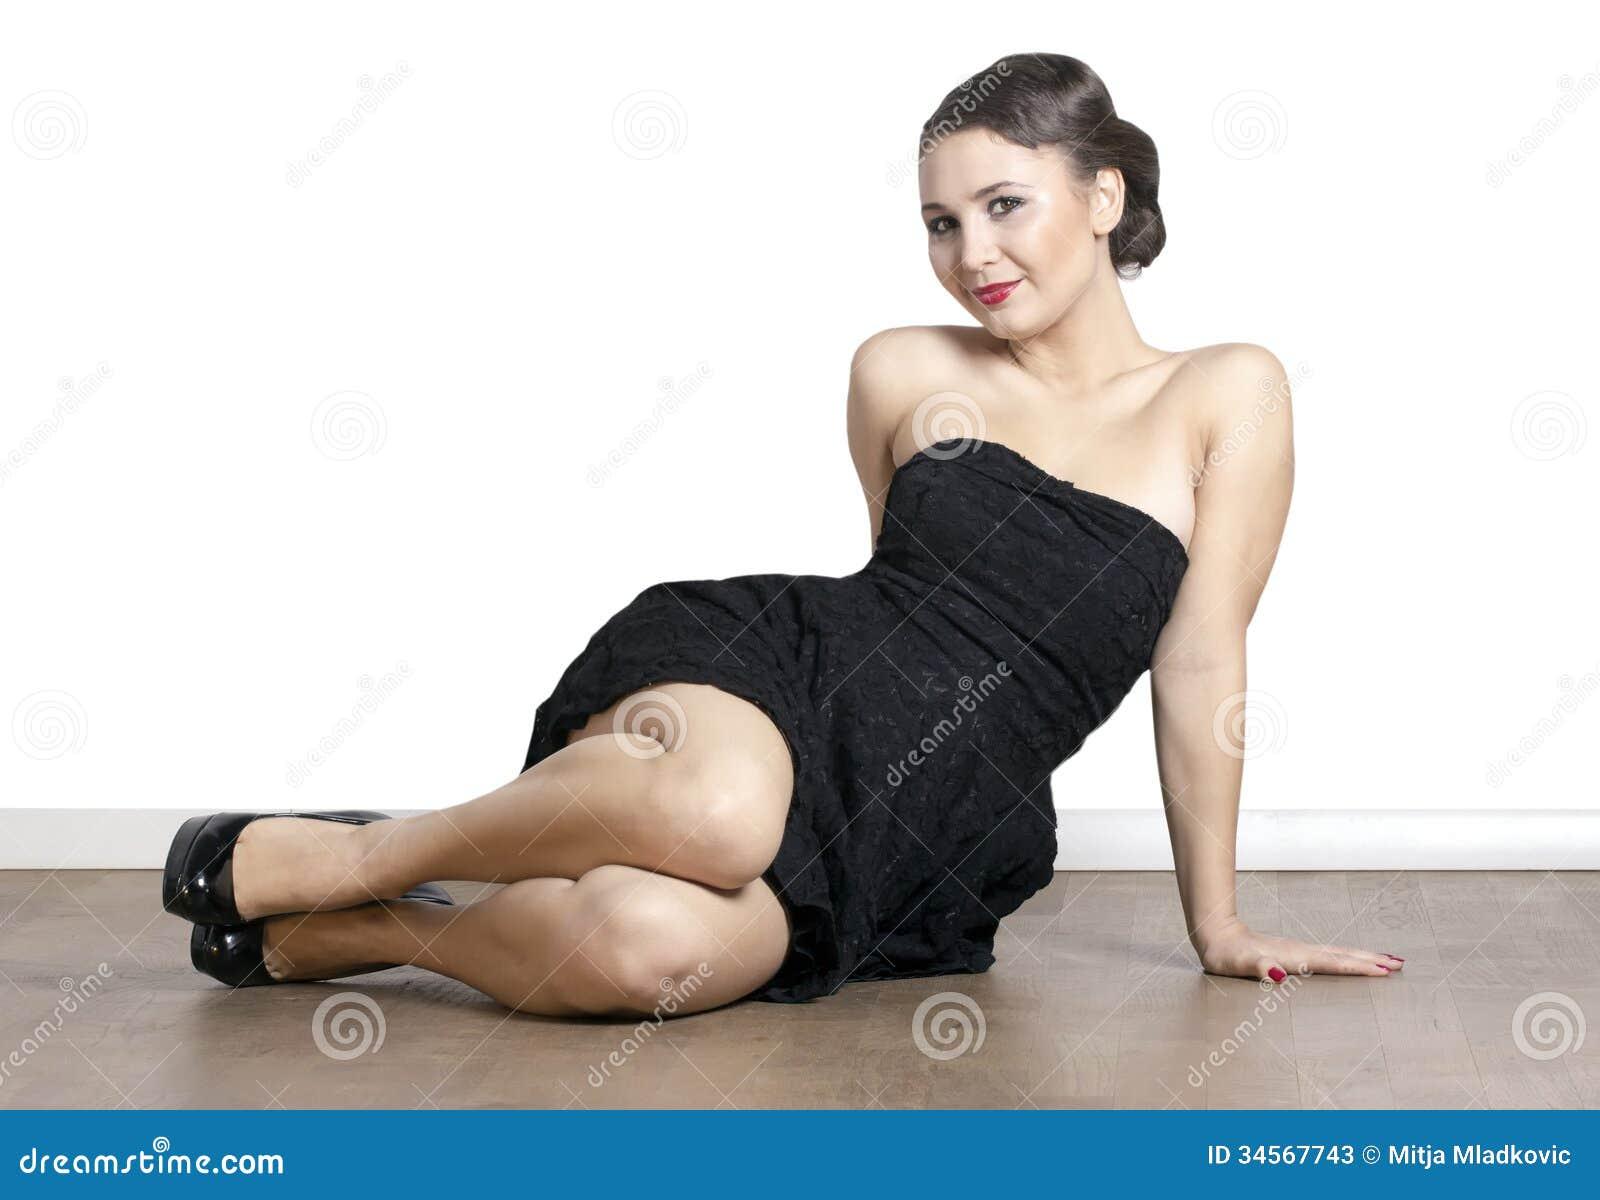 Woman Sitting On The Floor Stock Photos - Image: 34567743